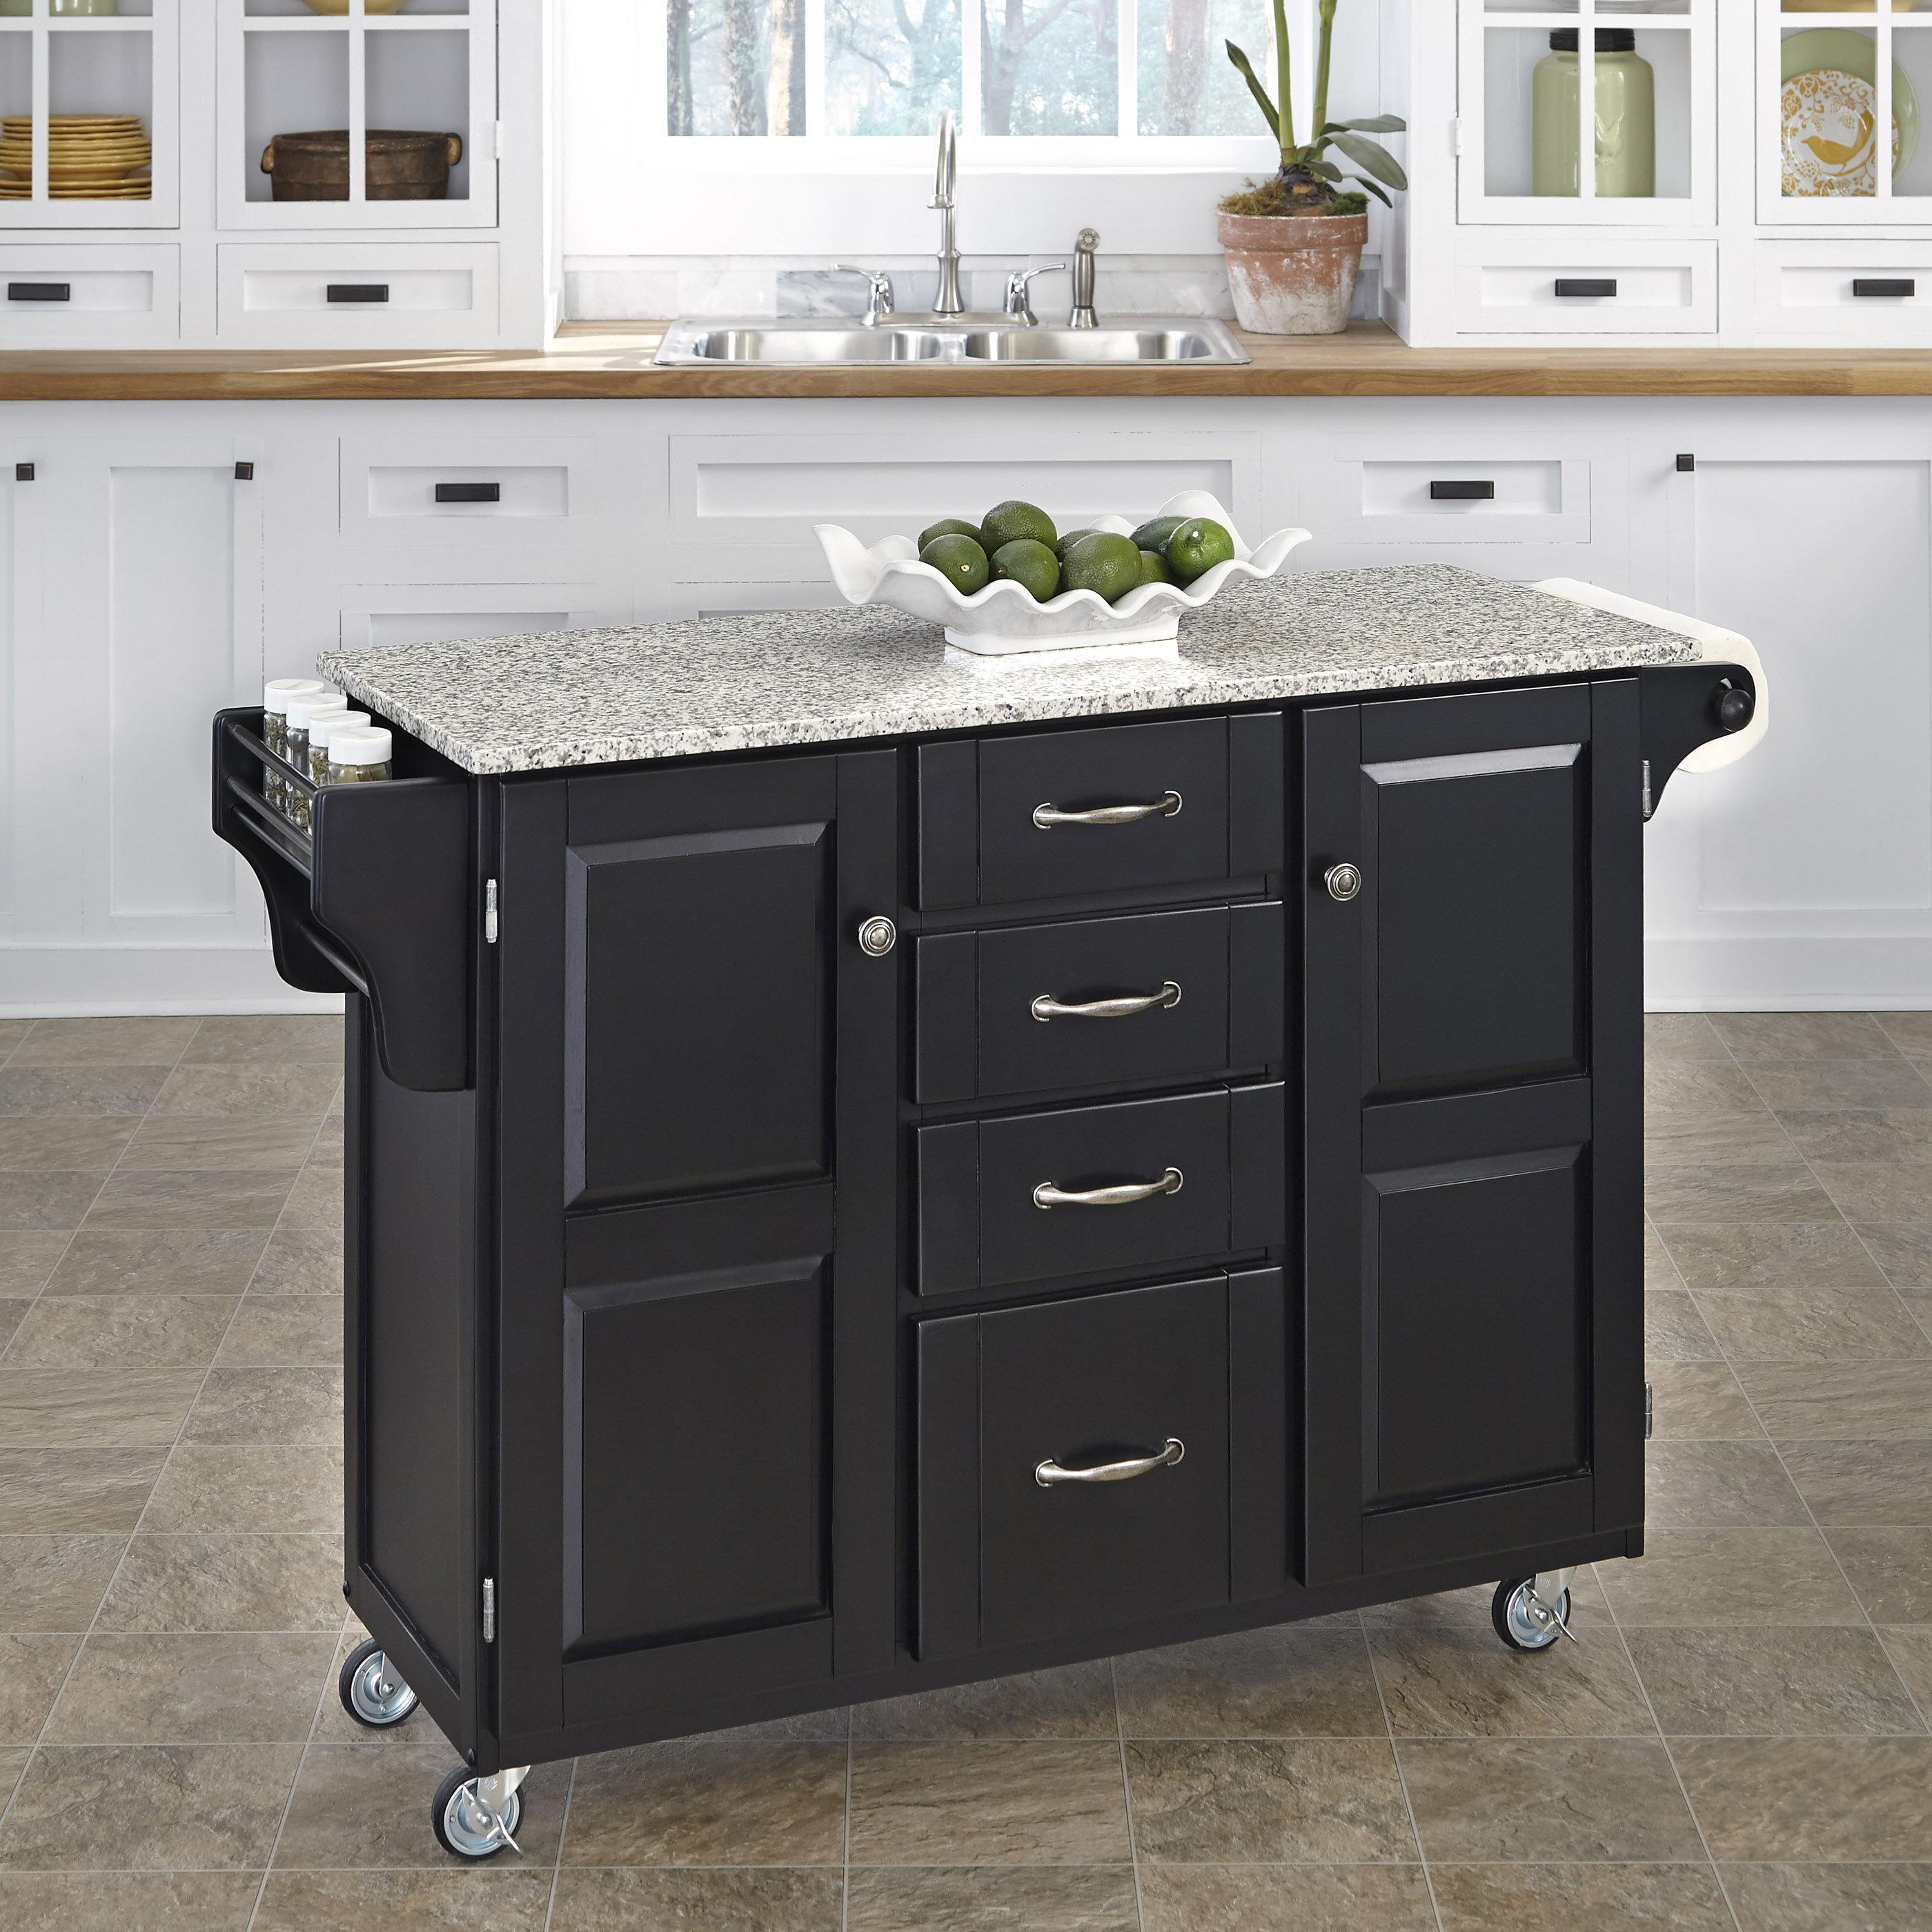 Legler-a-Cart Kitchen Island with Granite Top